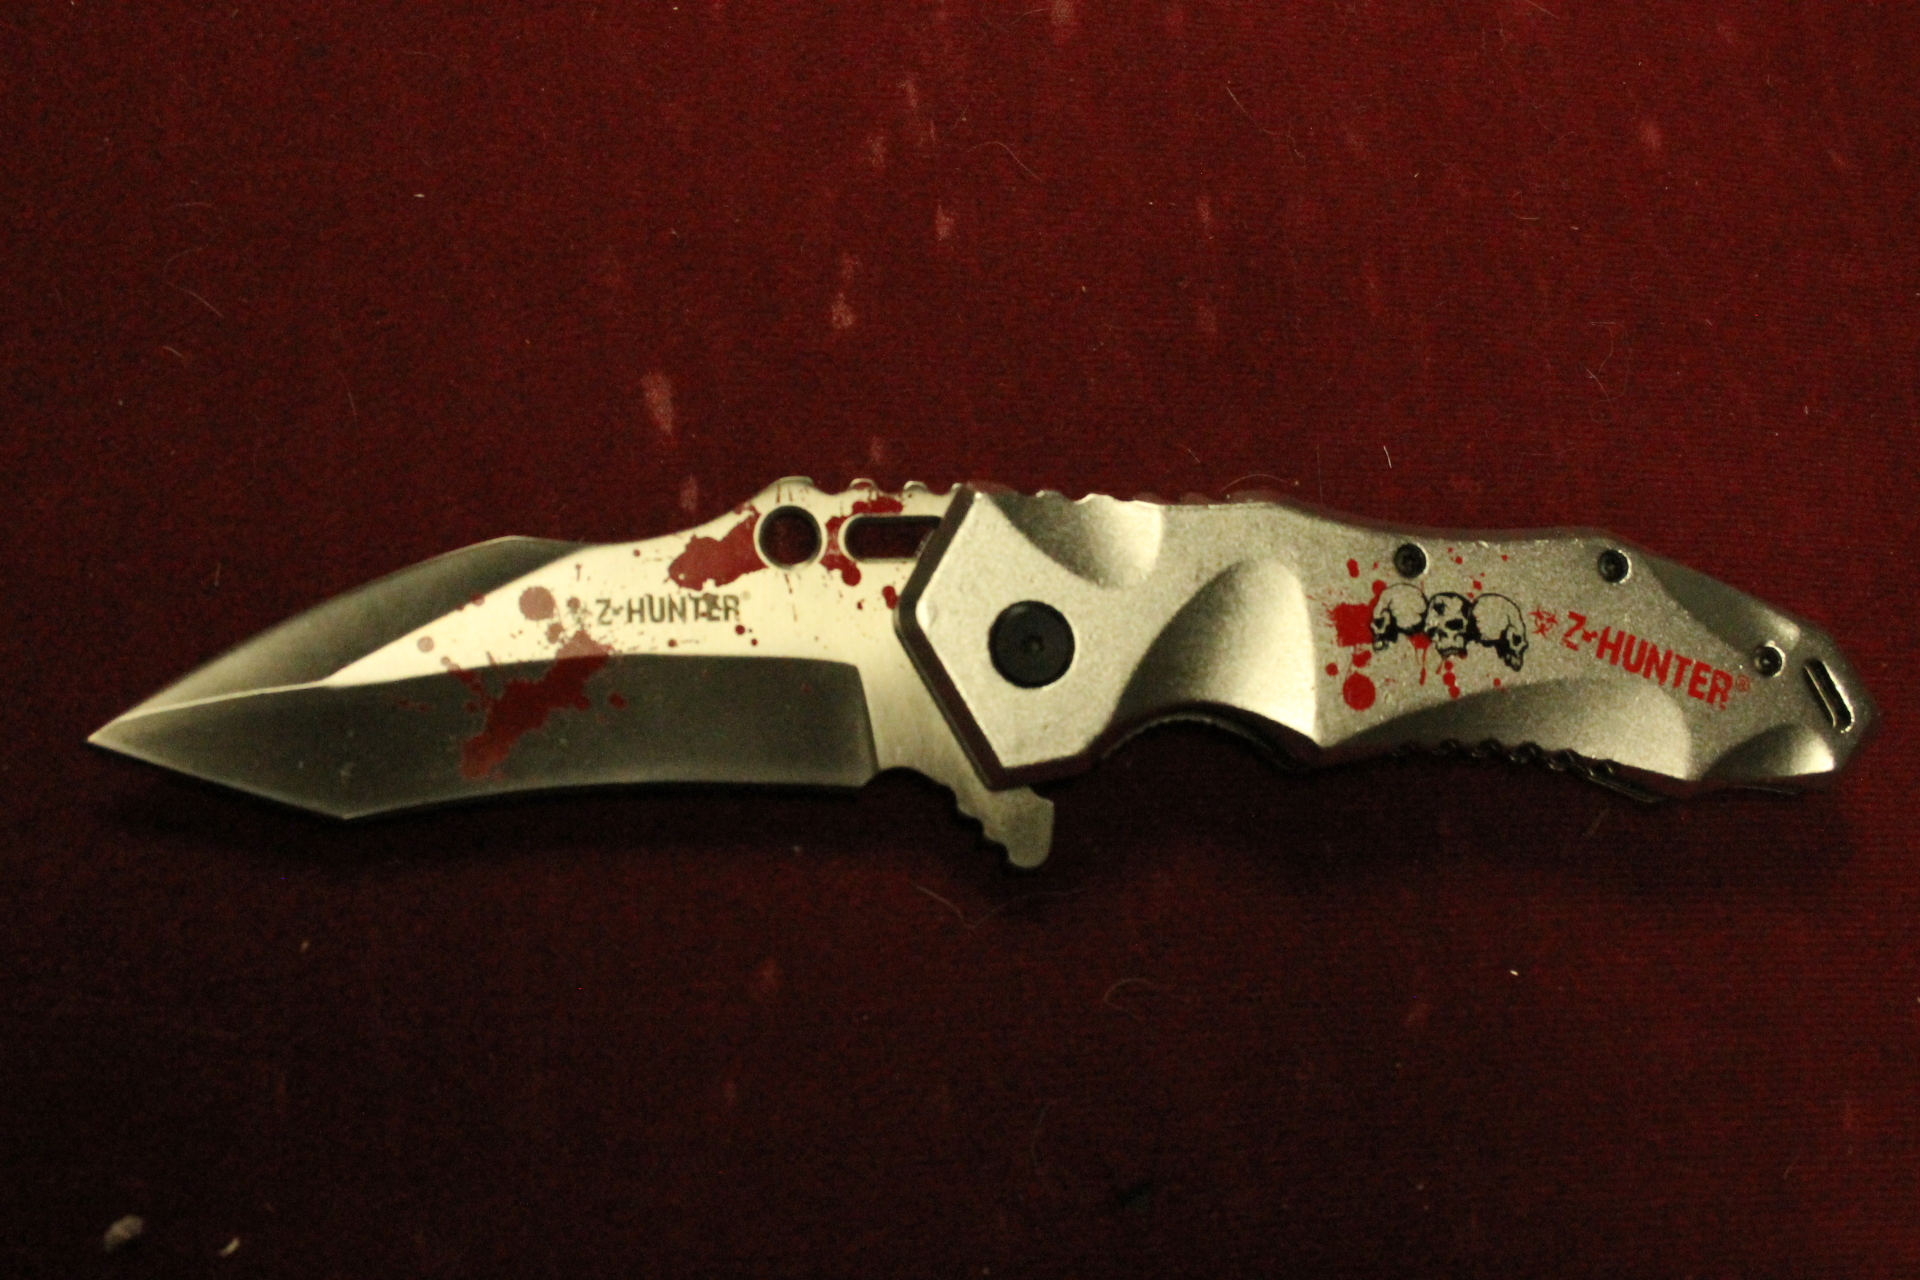 Z-Hunter Folding Tactical Knife $9.99